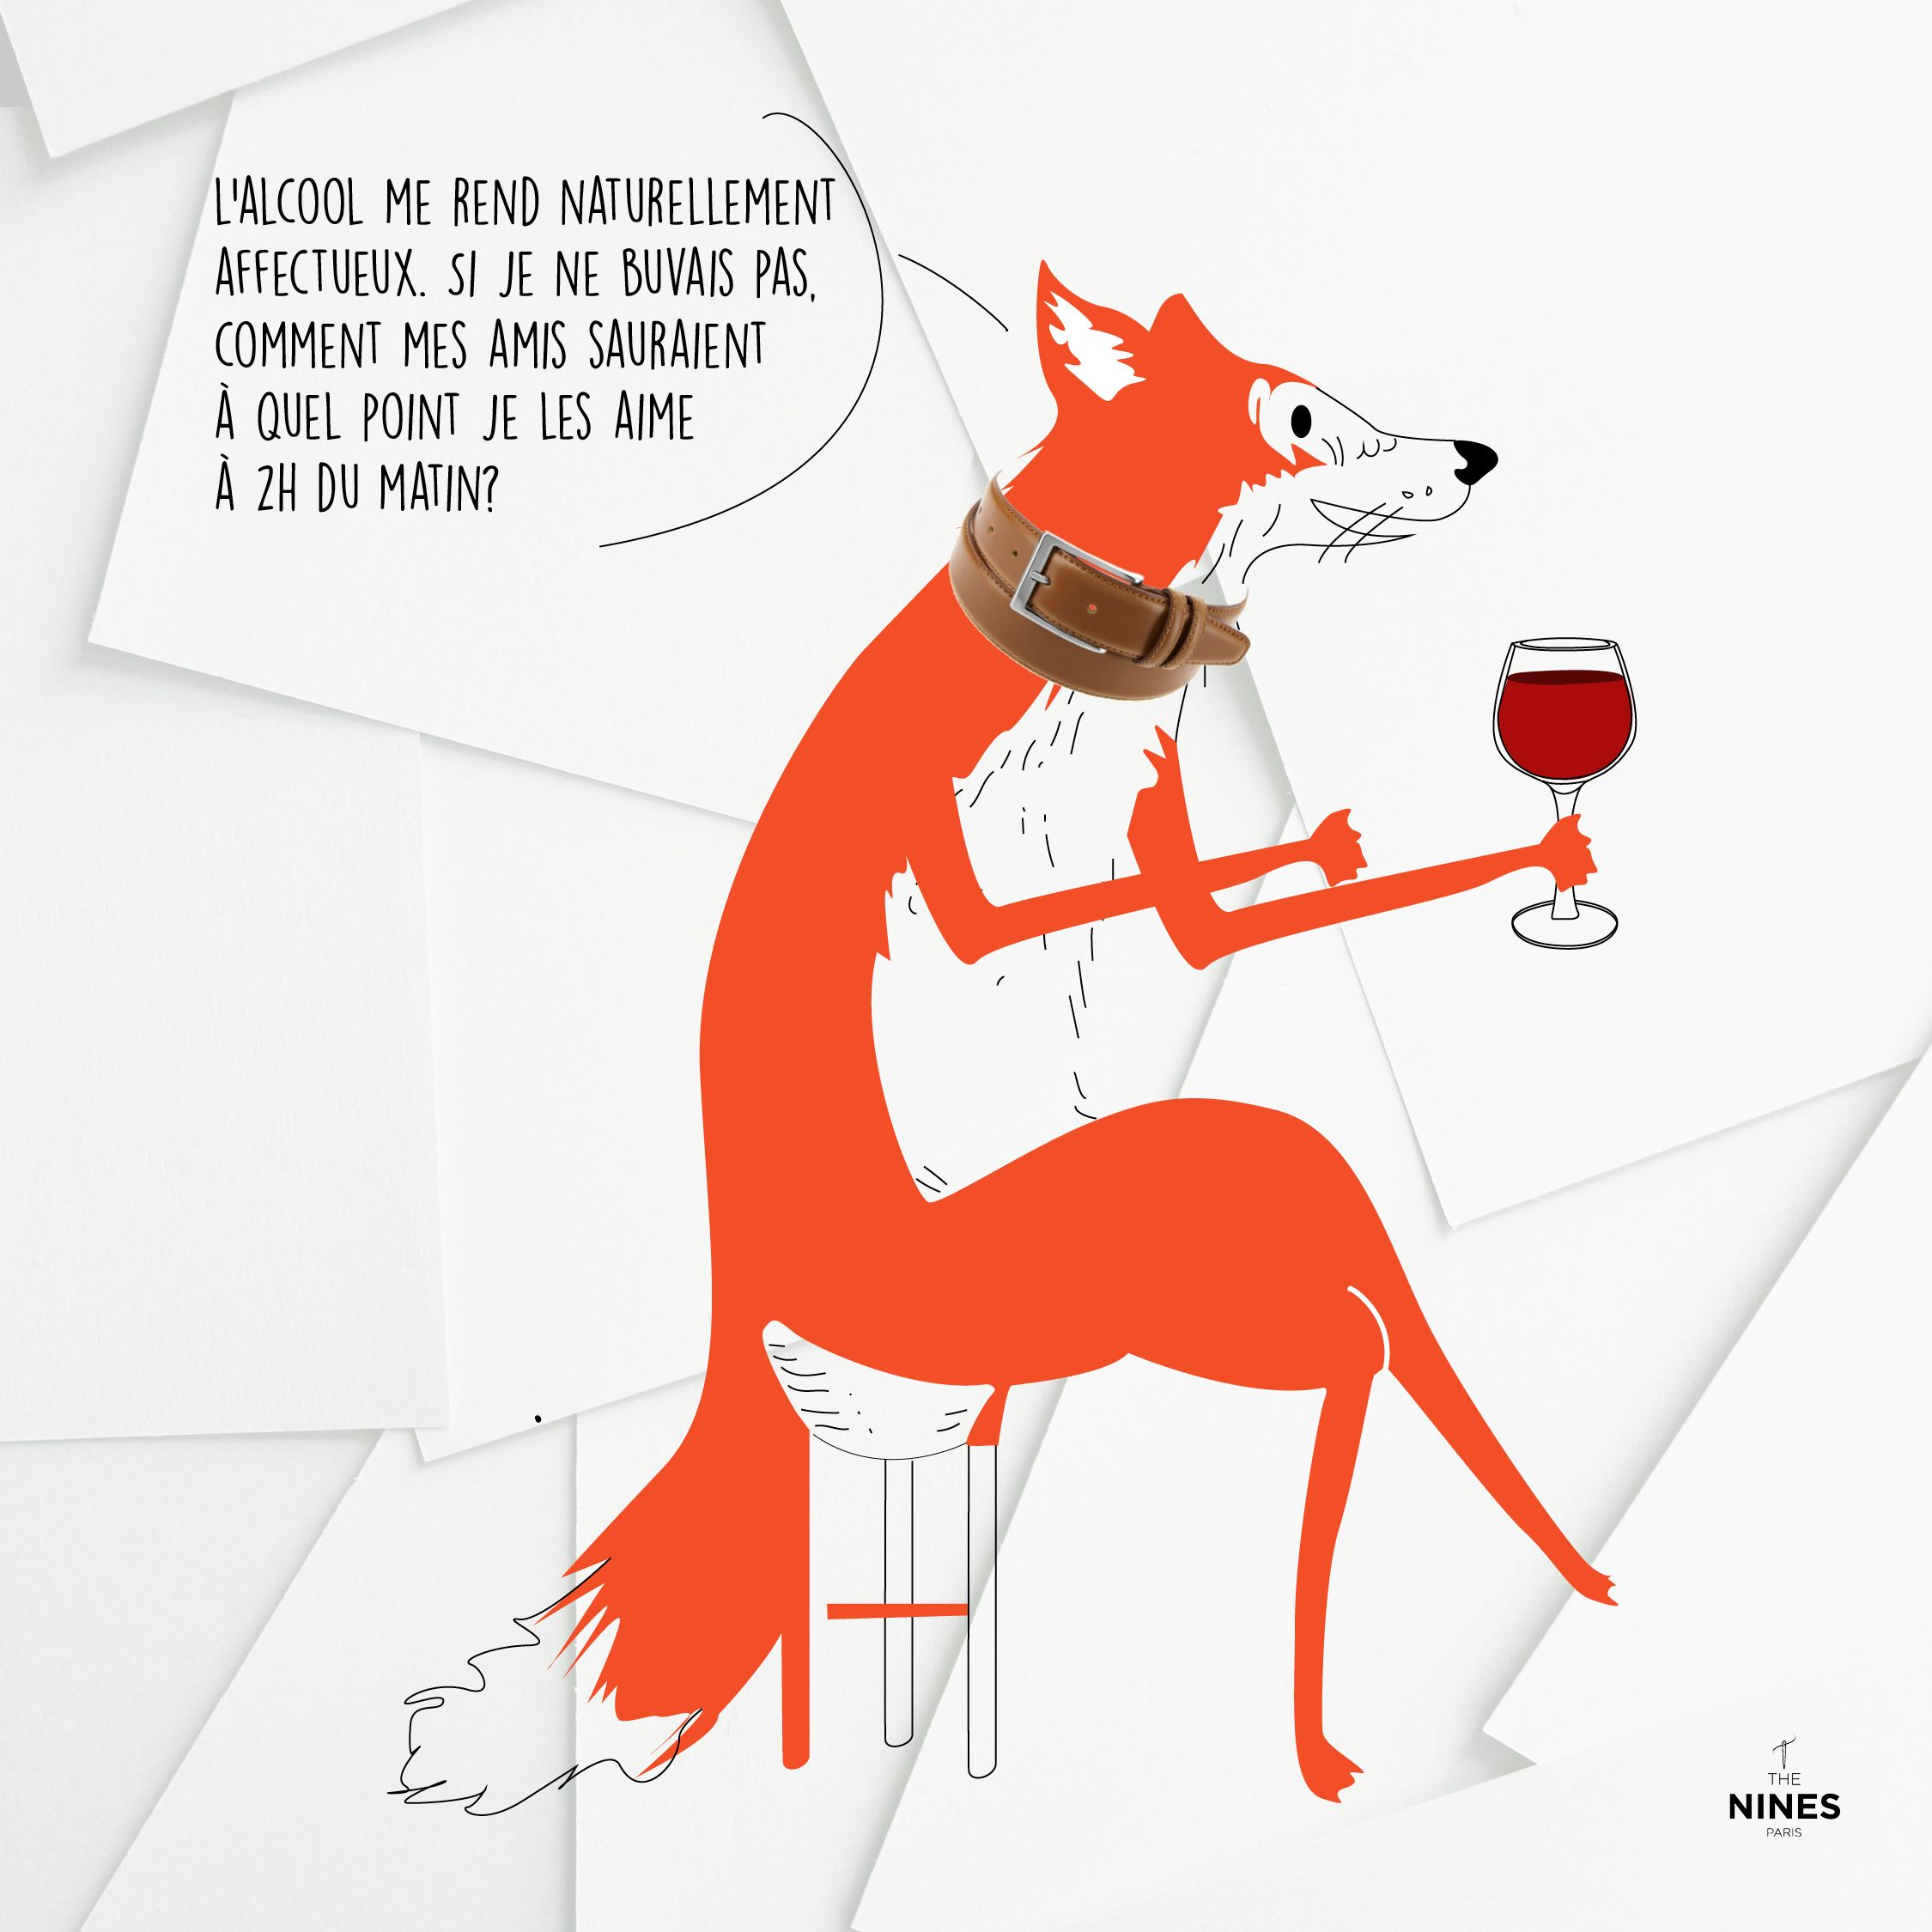 Soyez Naturel  #mood #drawing #inspiration #wine #fun #quote #thenines #friends #humour #ceinture